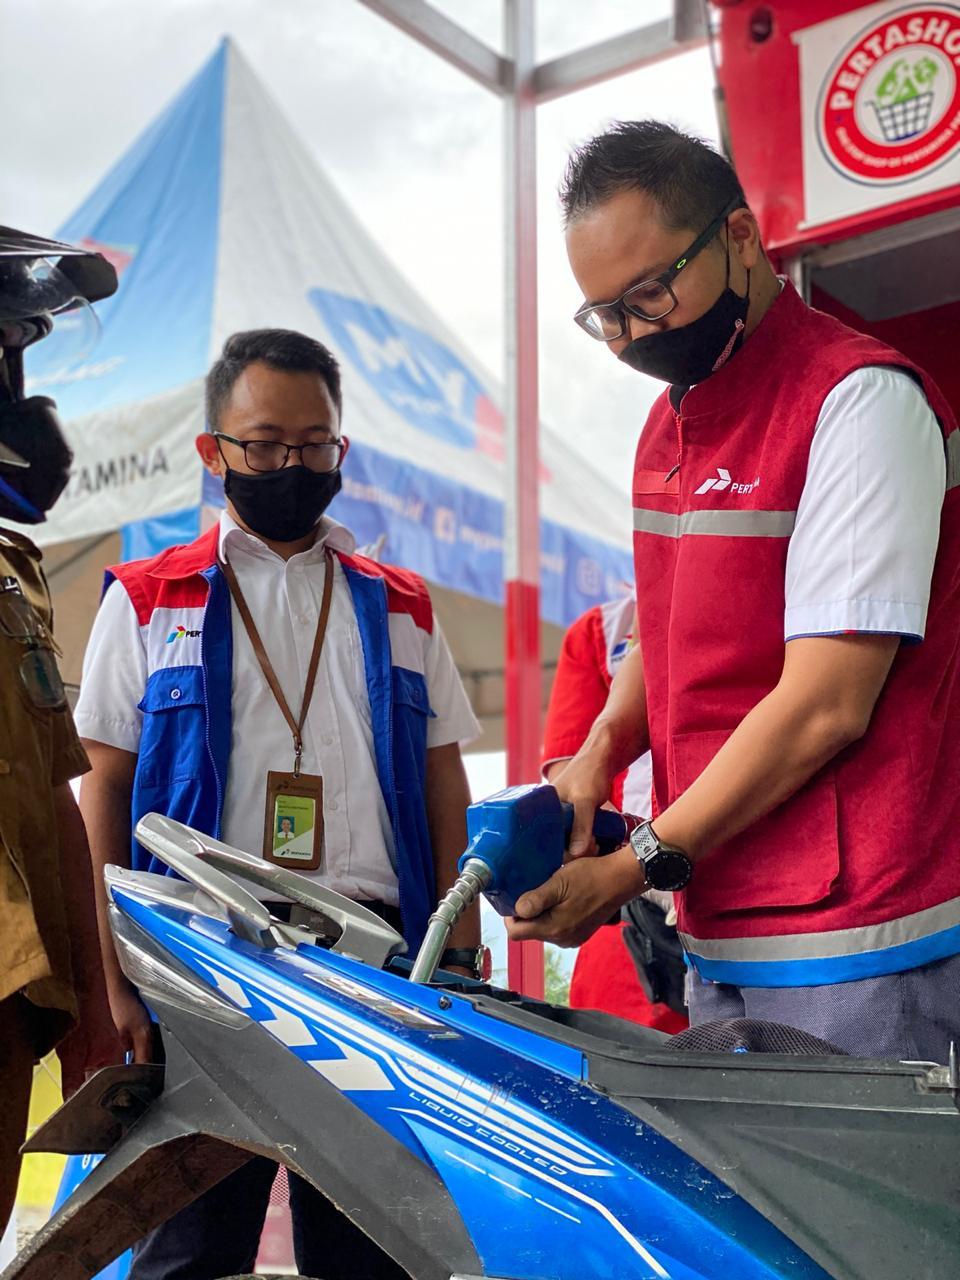 Gercap, Jelang Libur Panjang Maulid Nabi, Pertamina Jamin Stok BBM dan LPG di Sulawesi Aman